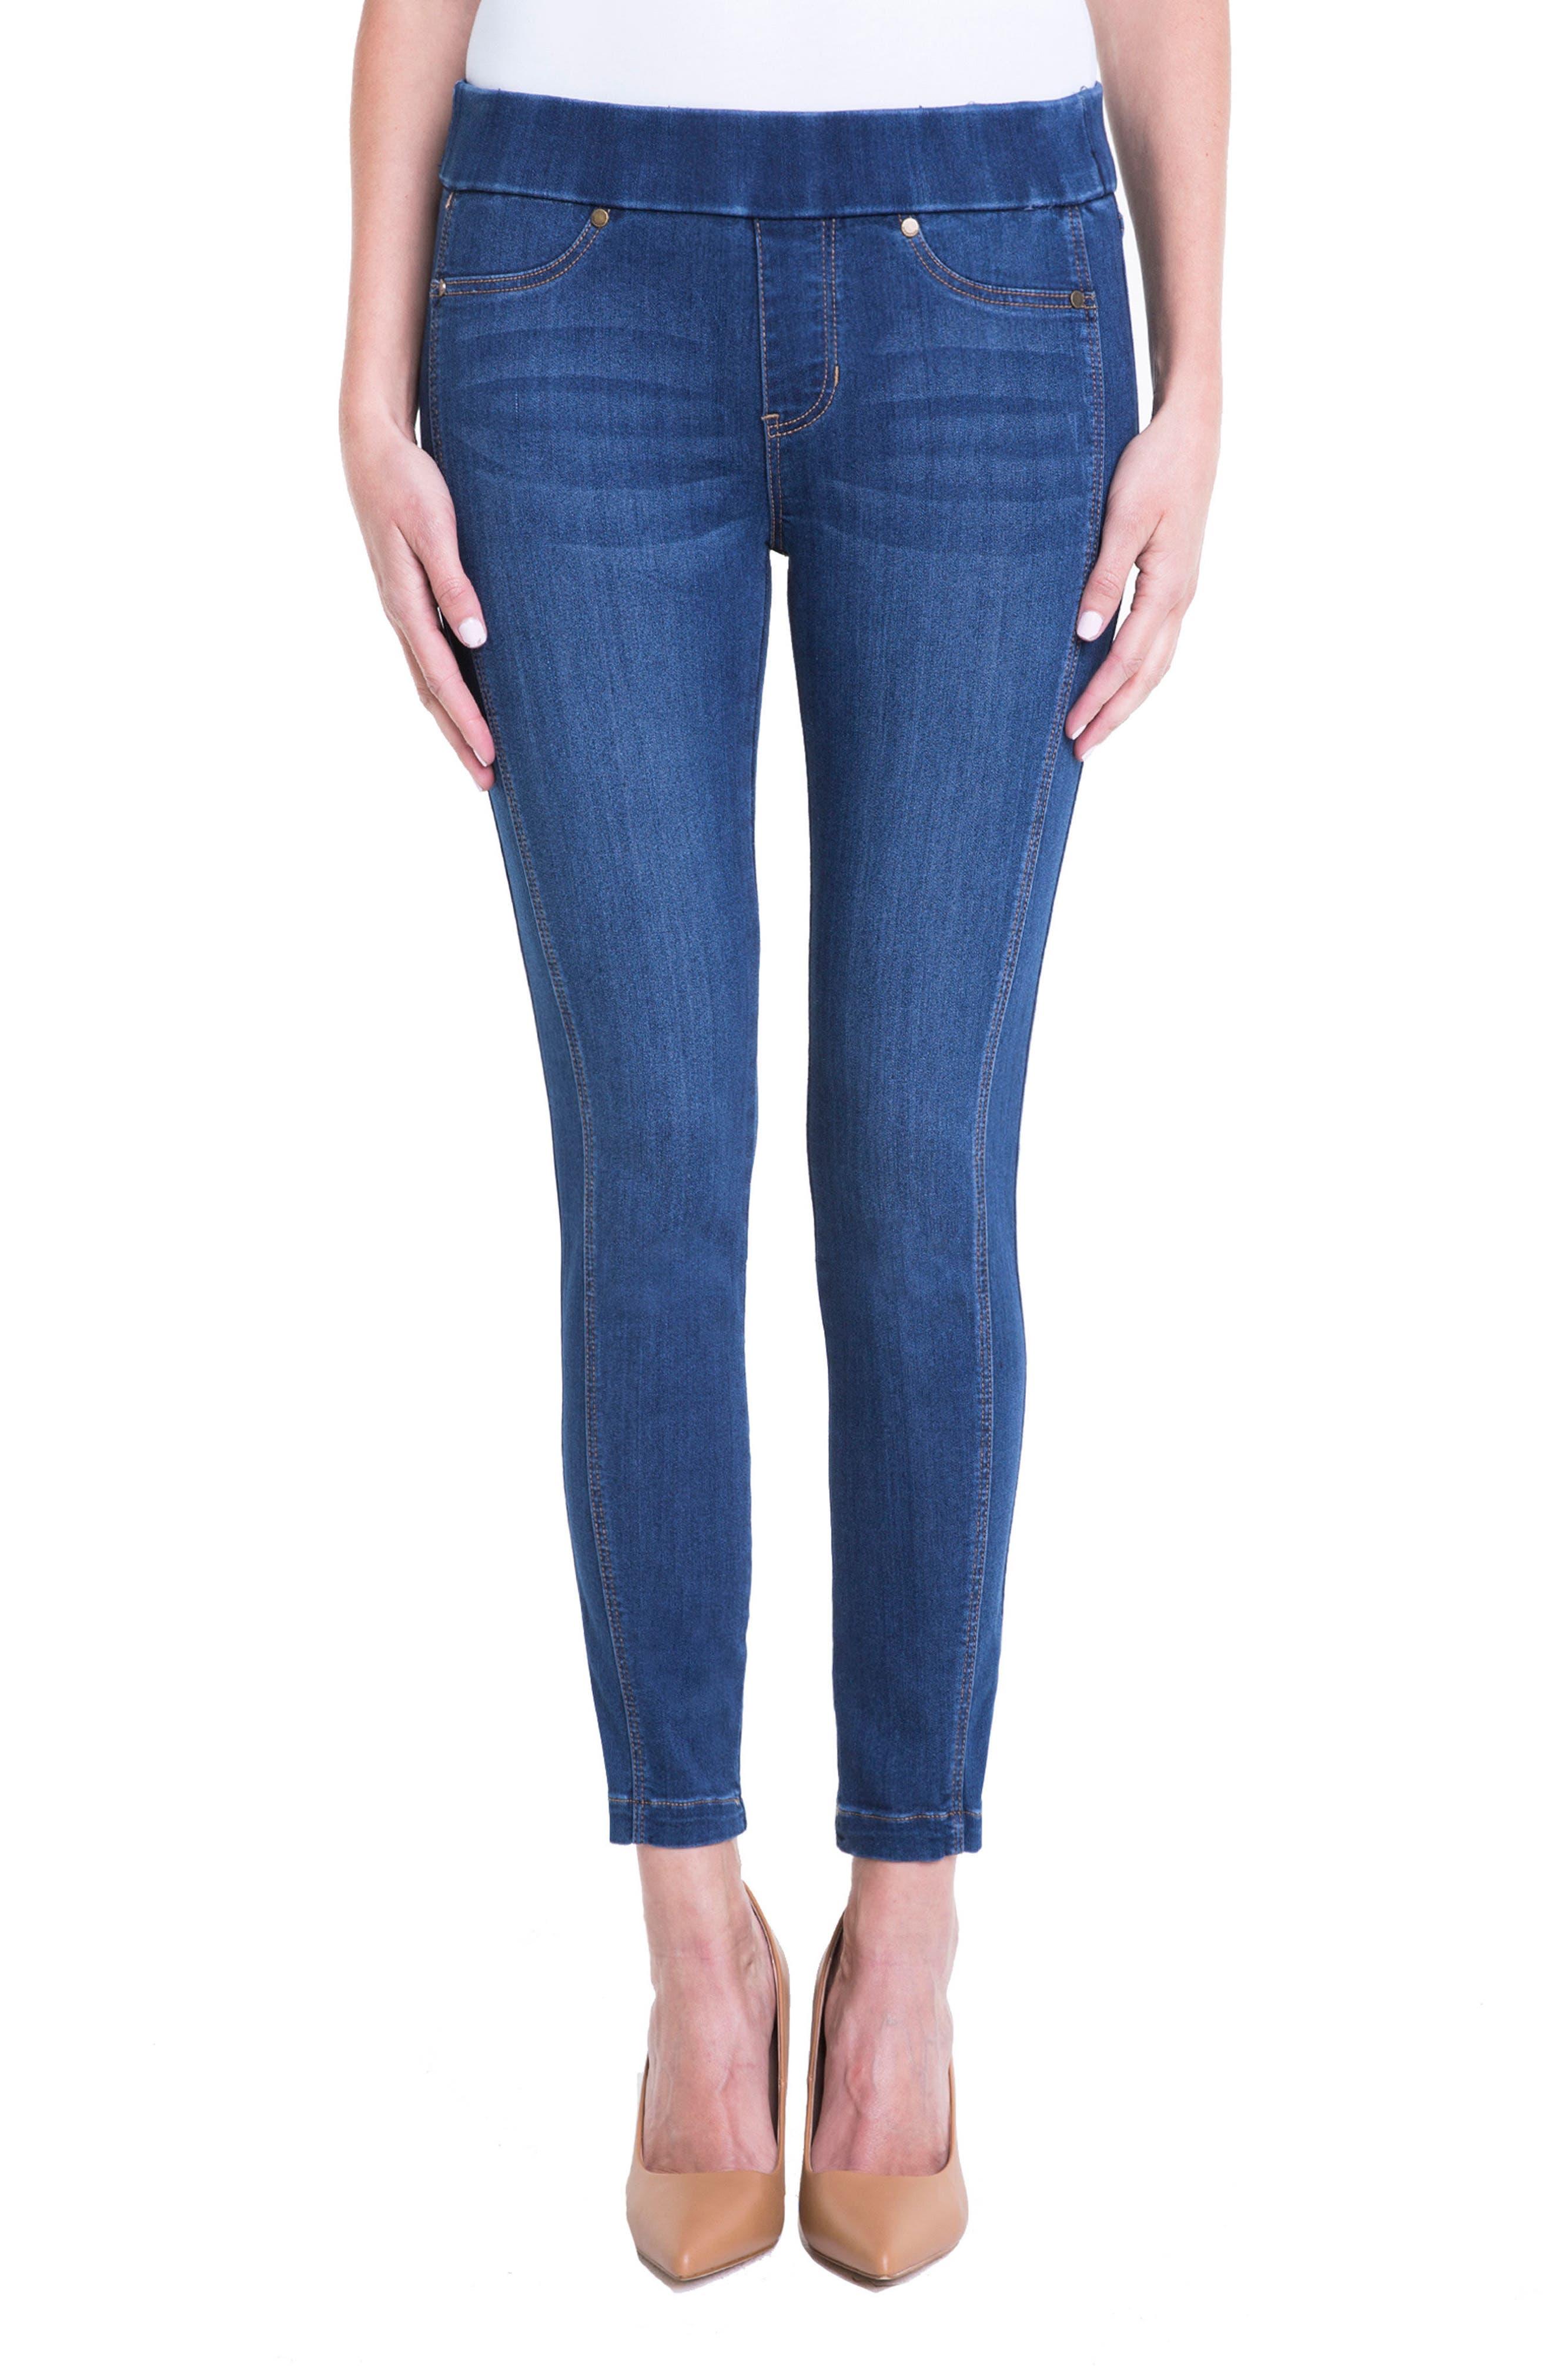 Main Image - Liverpool Jeans Company Sophia Ankle Denim Leggings (Regular & Petite)